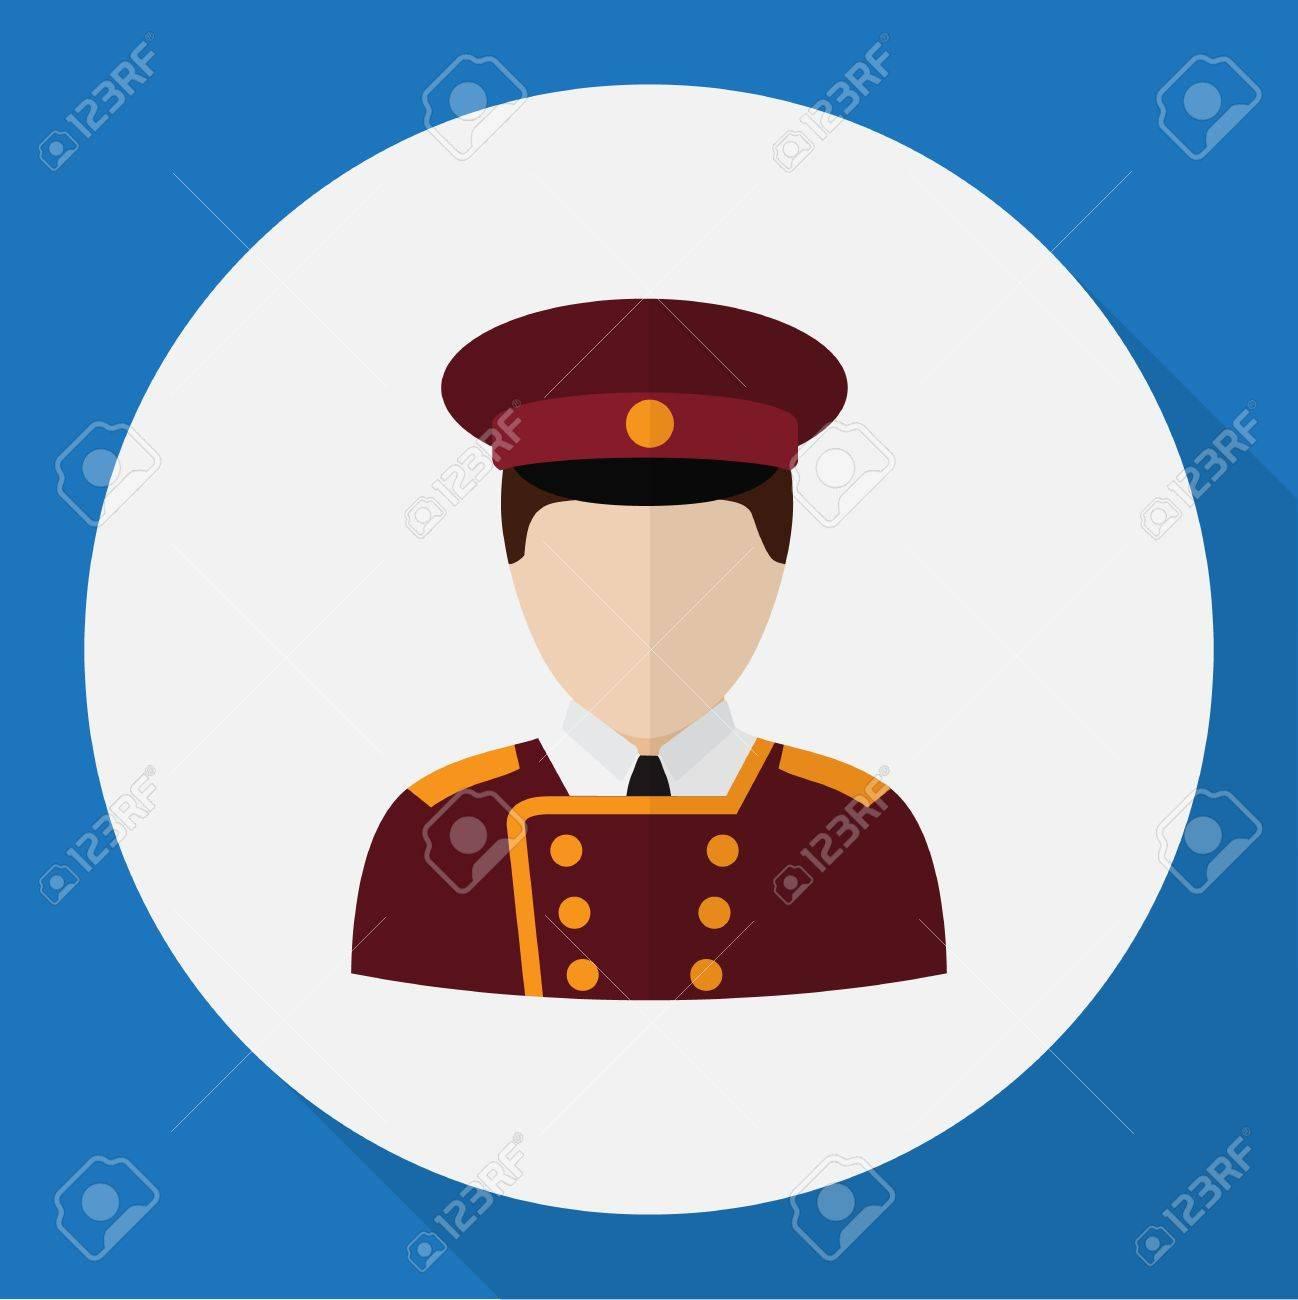 Vector Illustration Of Job Symbol On Porter Flat Icon. Premium Quality Isolated Doorman Element In Trendy Flat Style. - 82873550